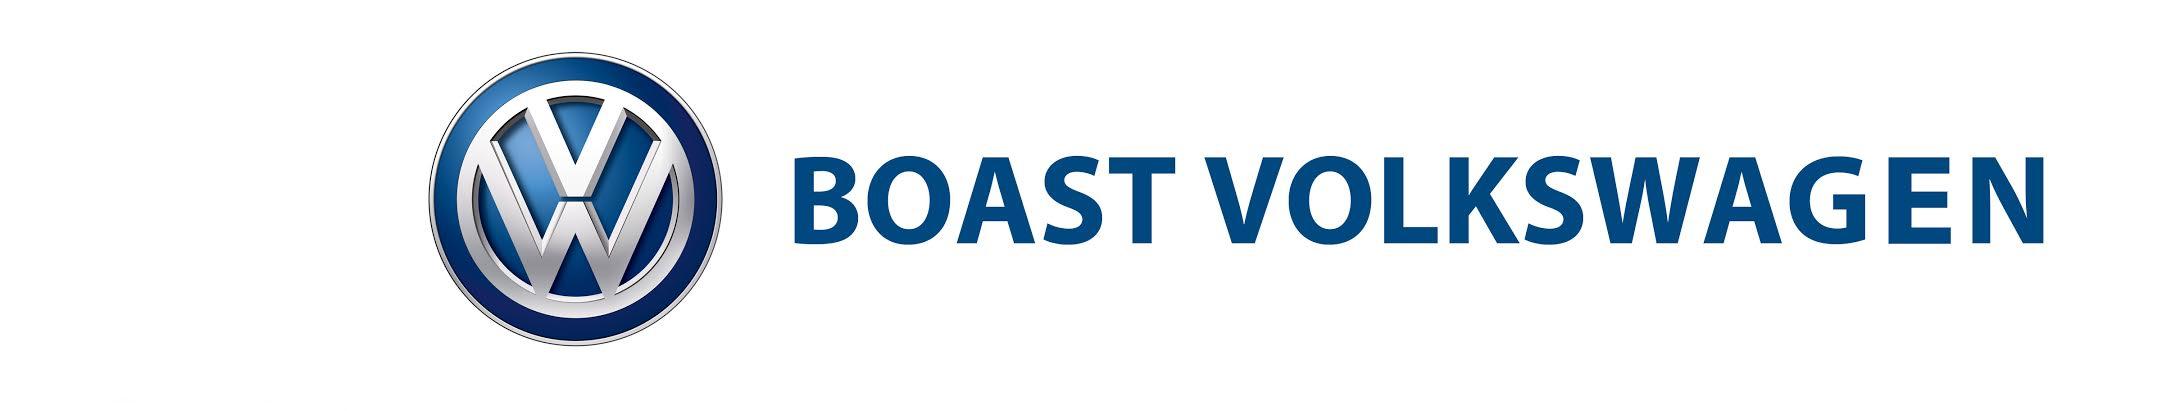 Bob Boast Volkswagen >> Boast Vw Logo